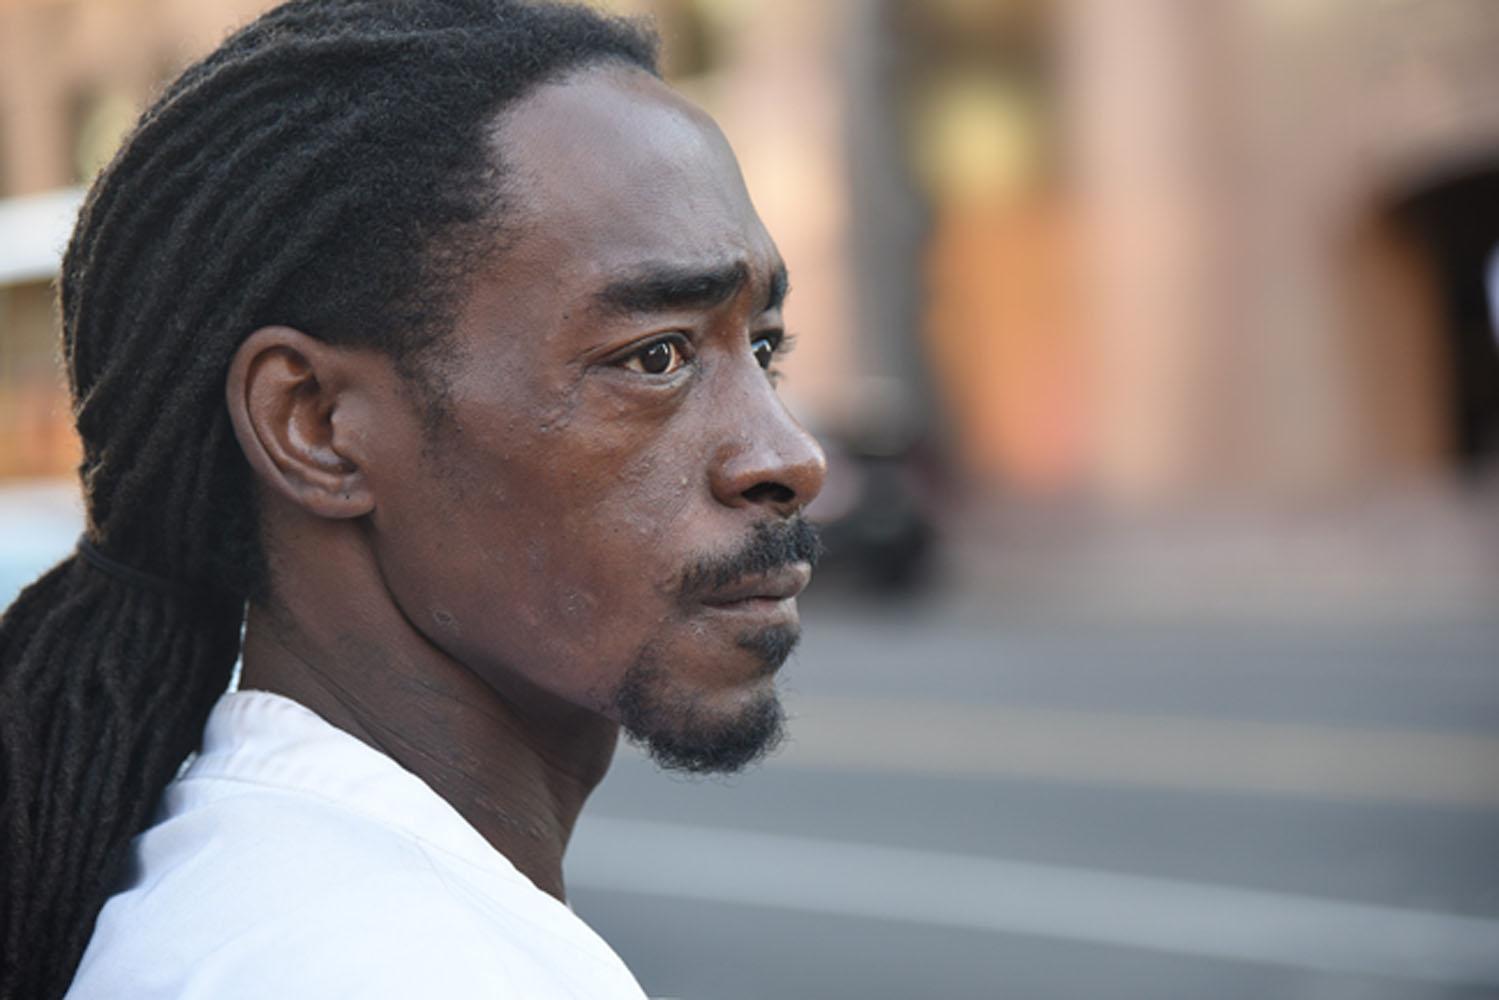 man on the street, 2017